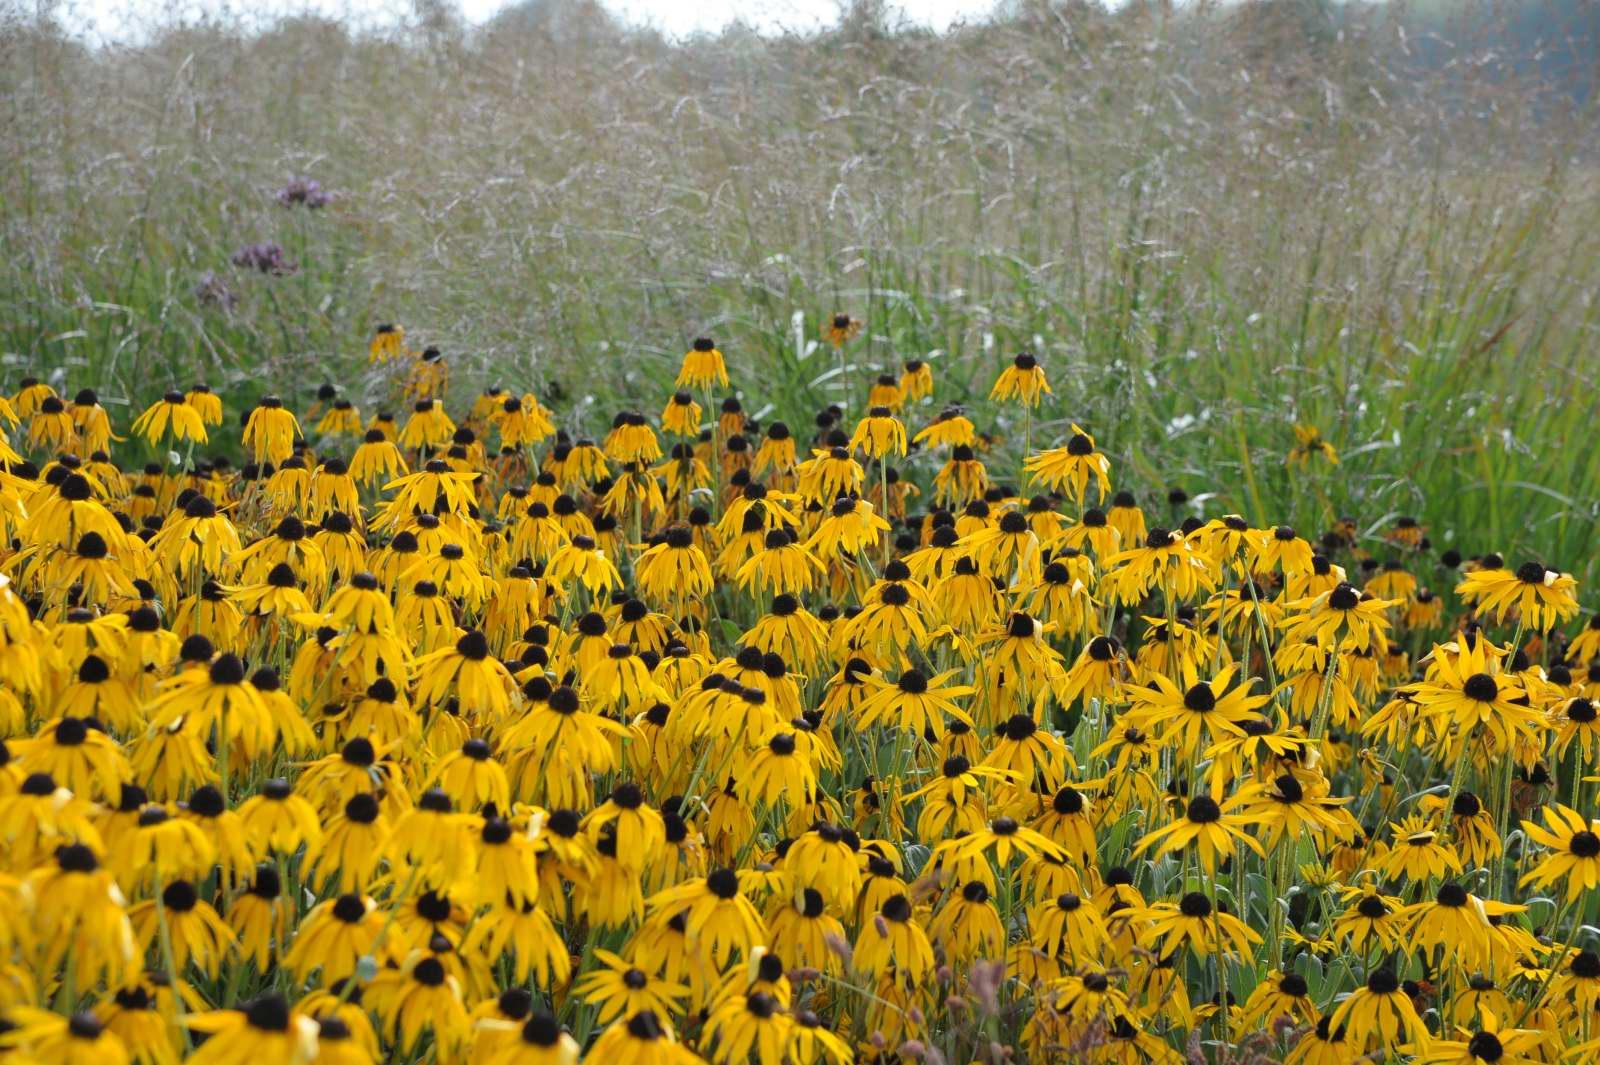 gelbe gartenblumen bestimmen – proxyagent, Gartenarbeit ideen